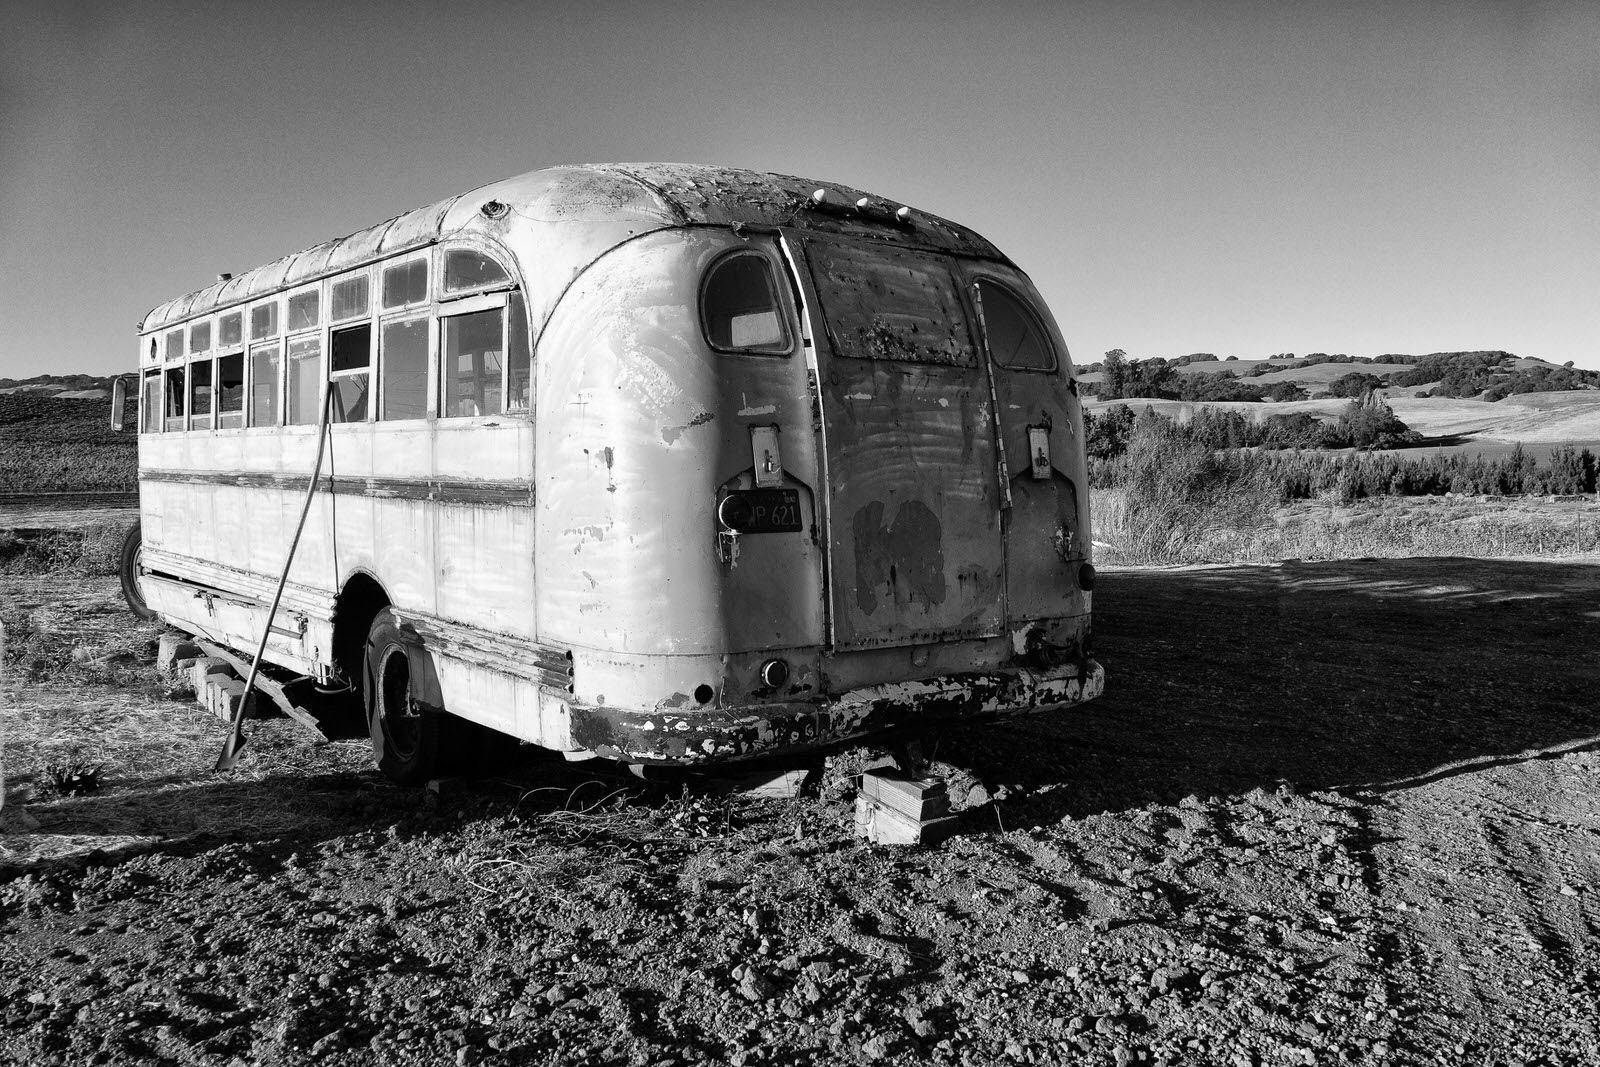 Magic Bus by Jose Lopez